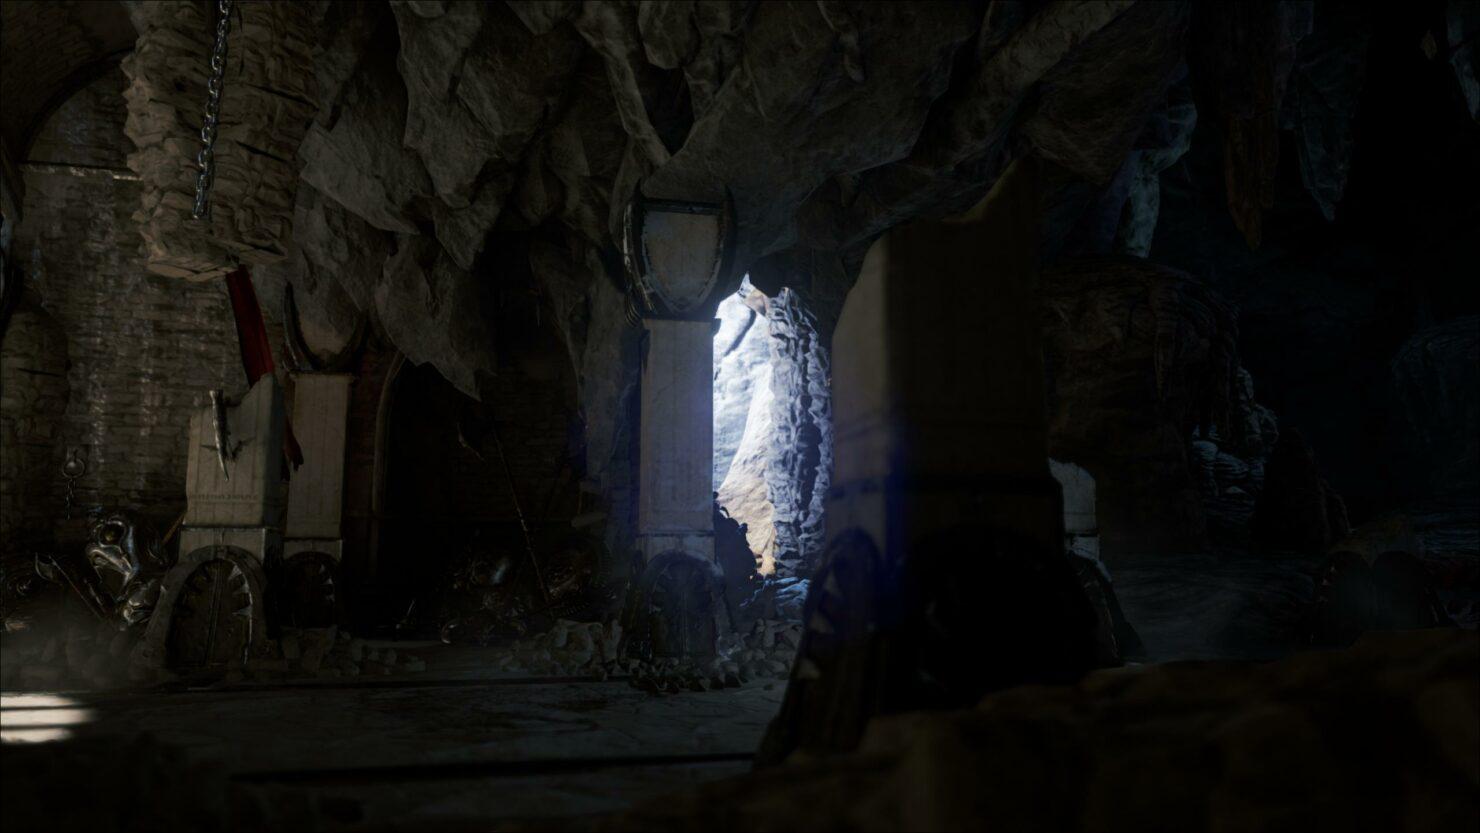 elemental-2014-04-28-22-55-36-72